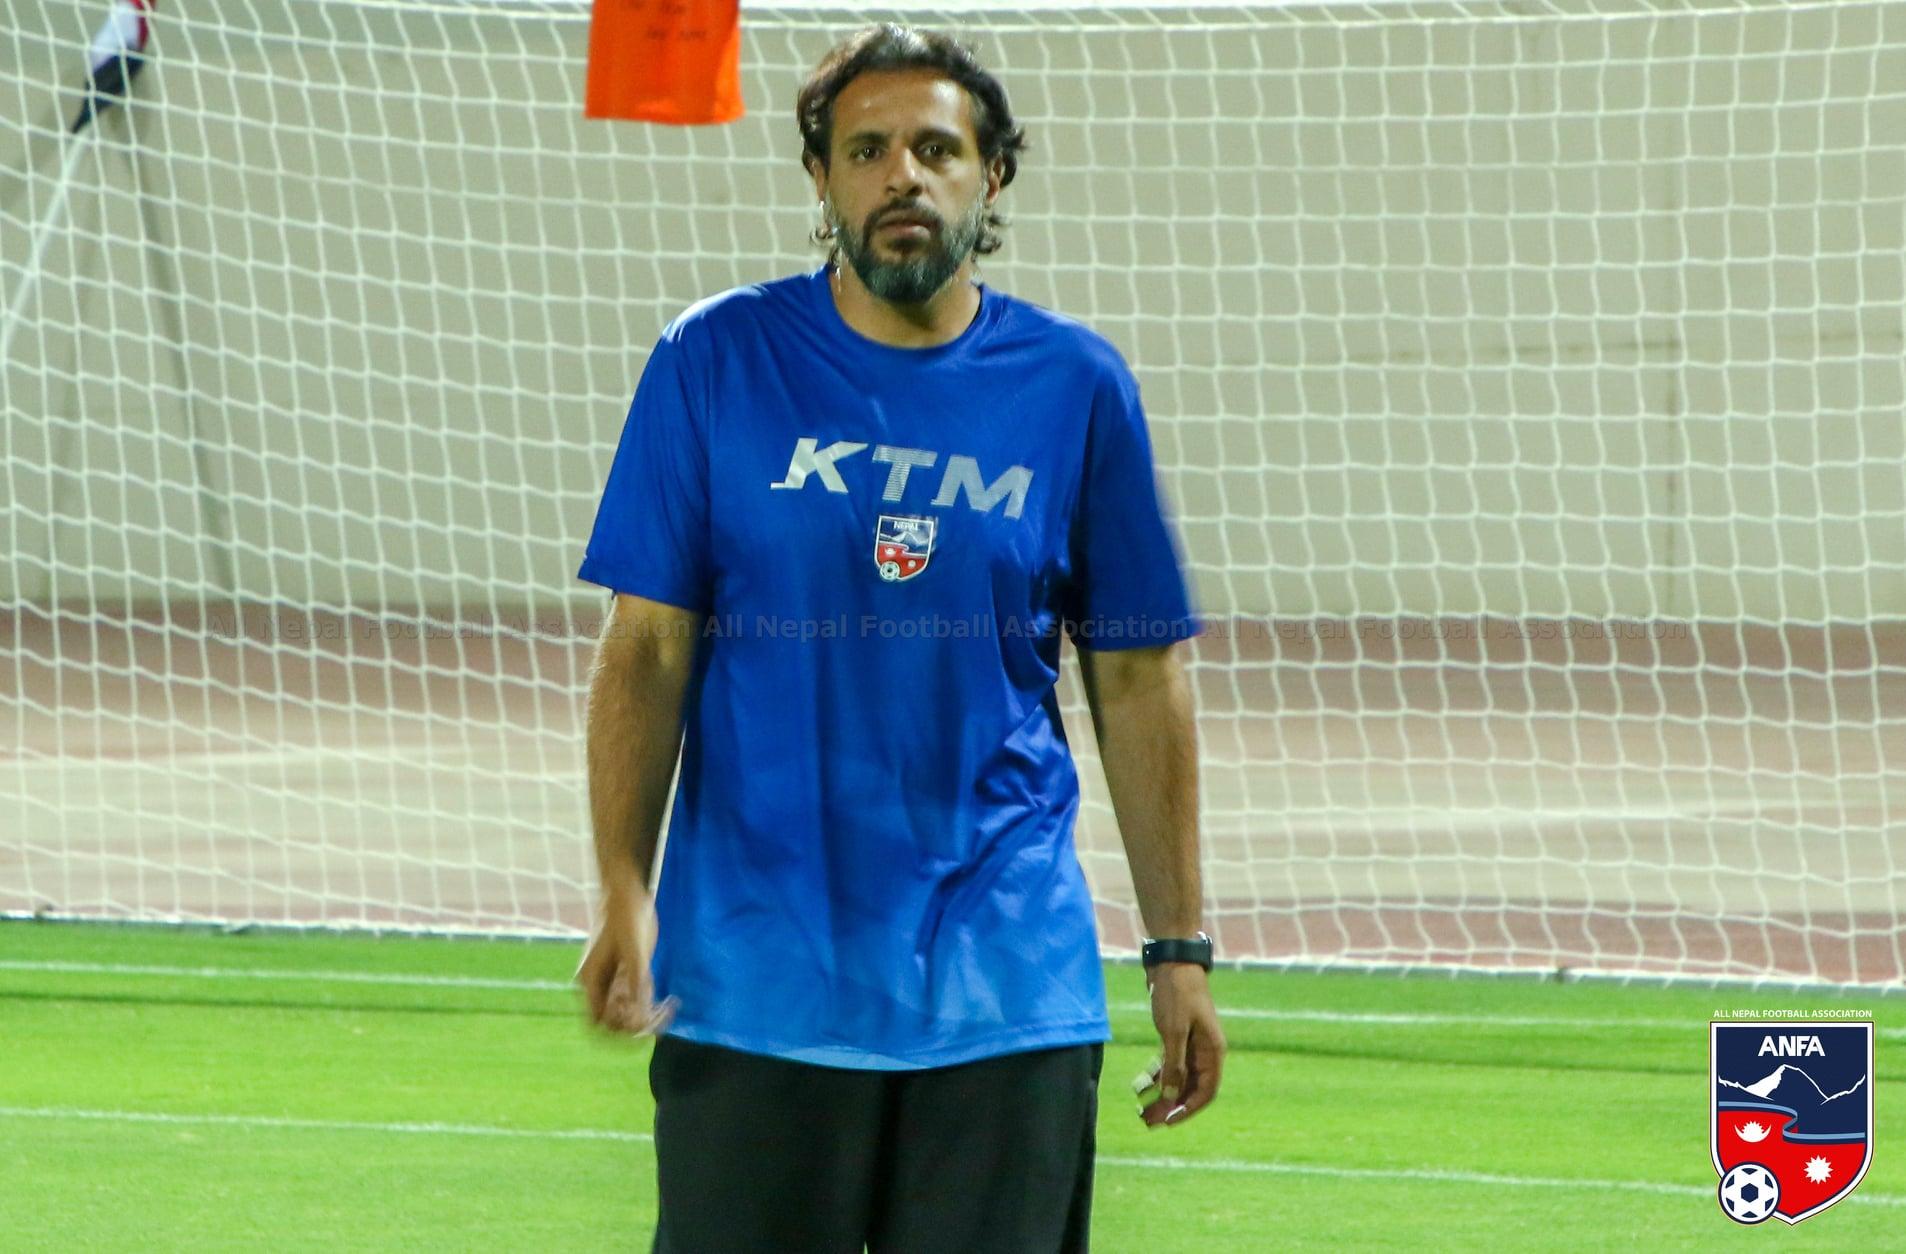 इराकसँगकाे हारपछि फुटबल टिमका मुख्य प्रशिक्षक अब्दुल्लाहले नेपाली समर्थकसँग माफी मागे